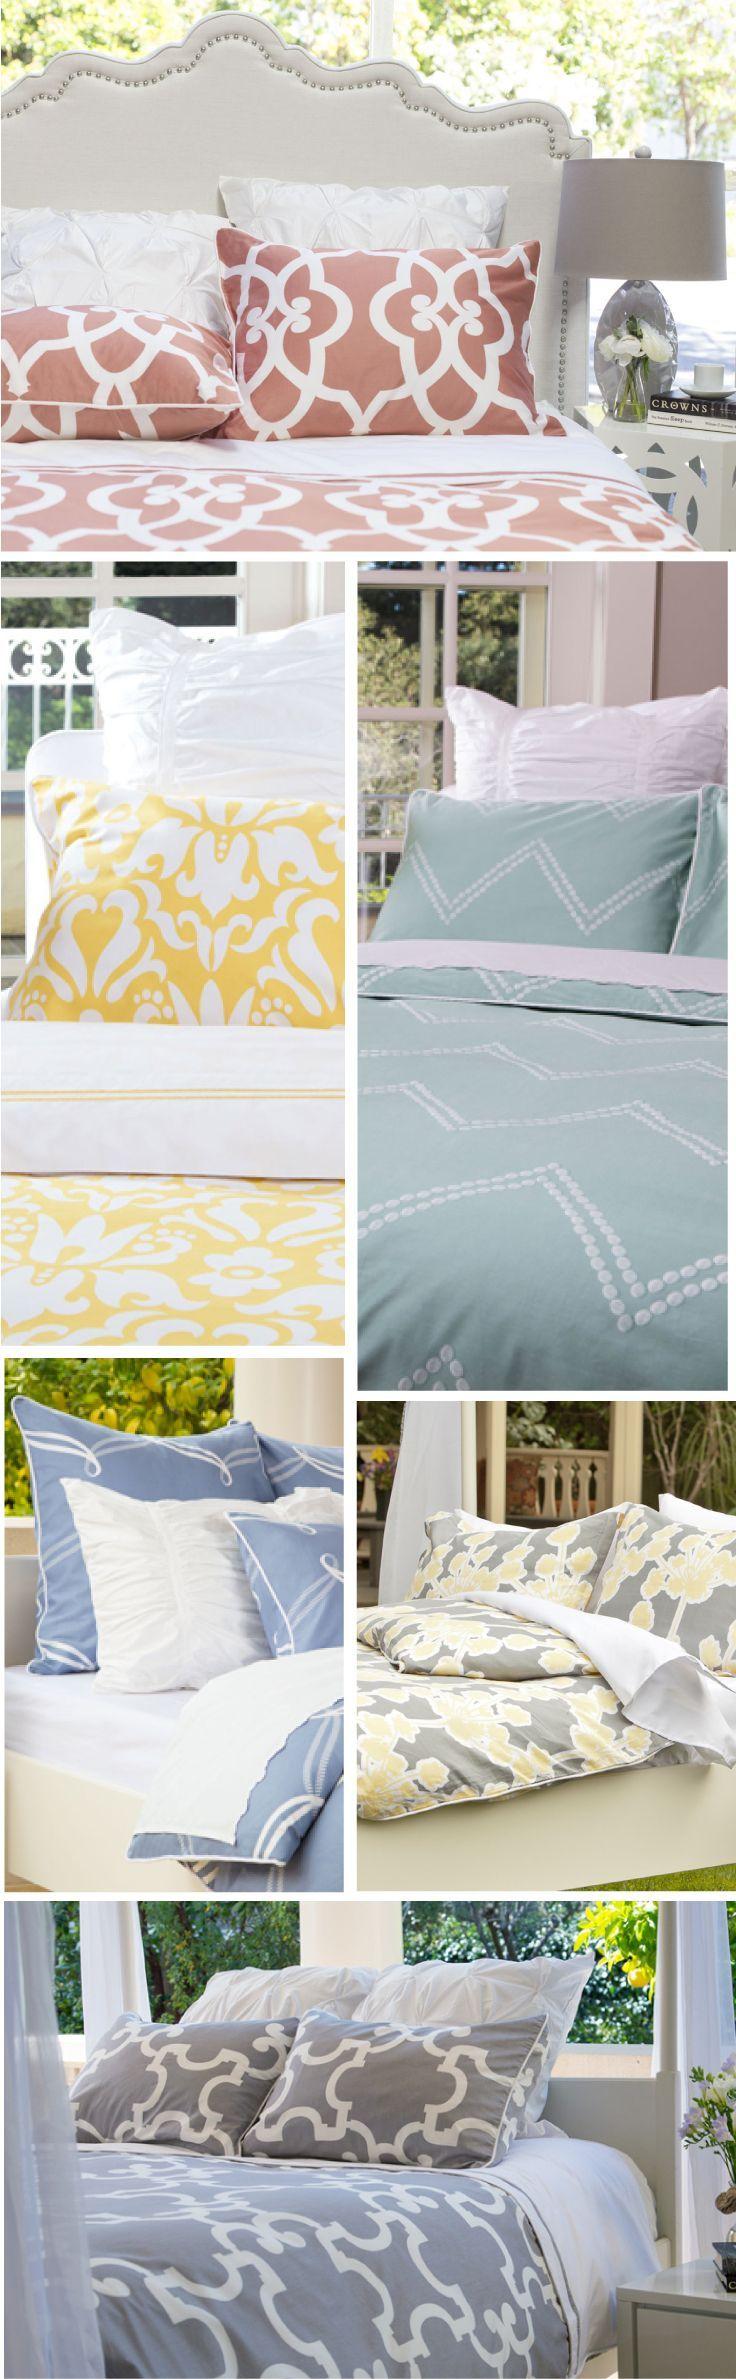 14 best awesome adult bedroom furniture images on pinterest bed